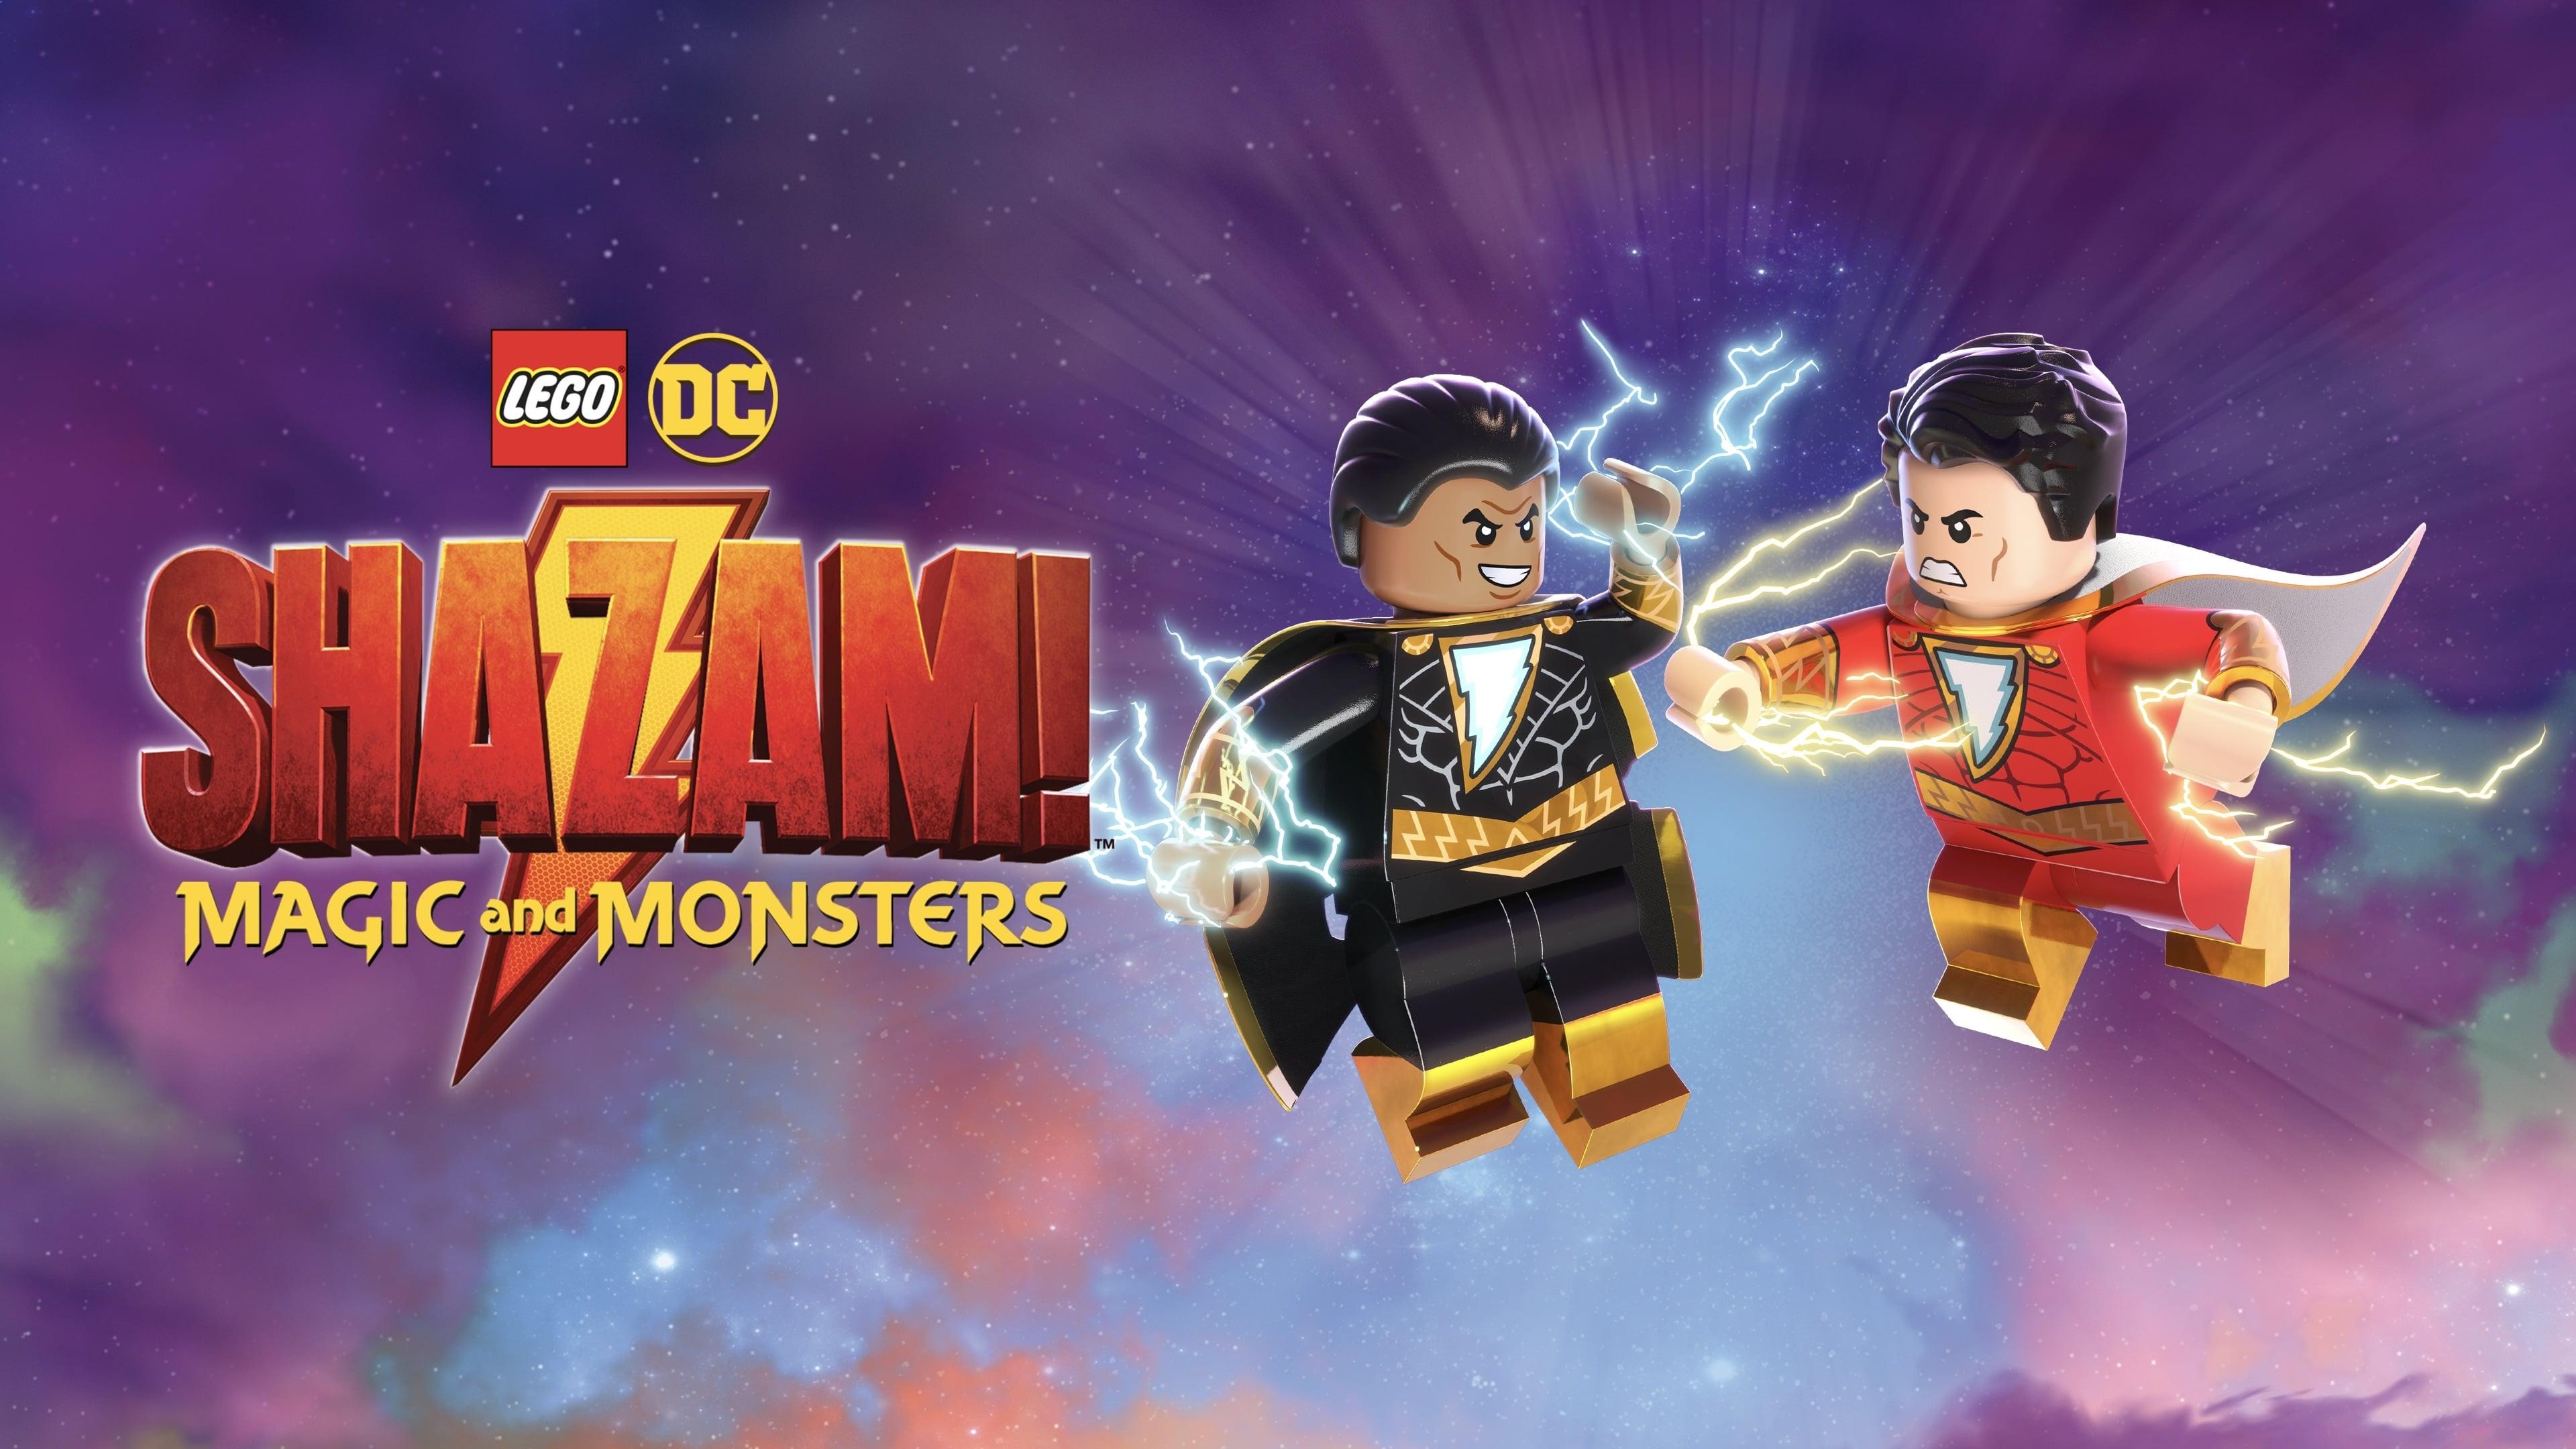 LEGO DC: ¡Shazam! Magia y Monstruos (2020) BDRip 1080p Latino-Inglés